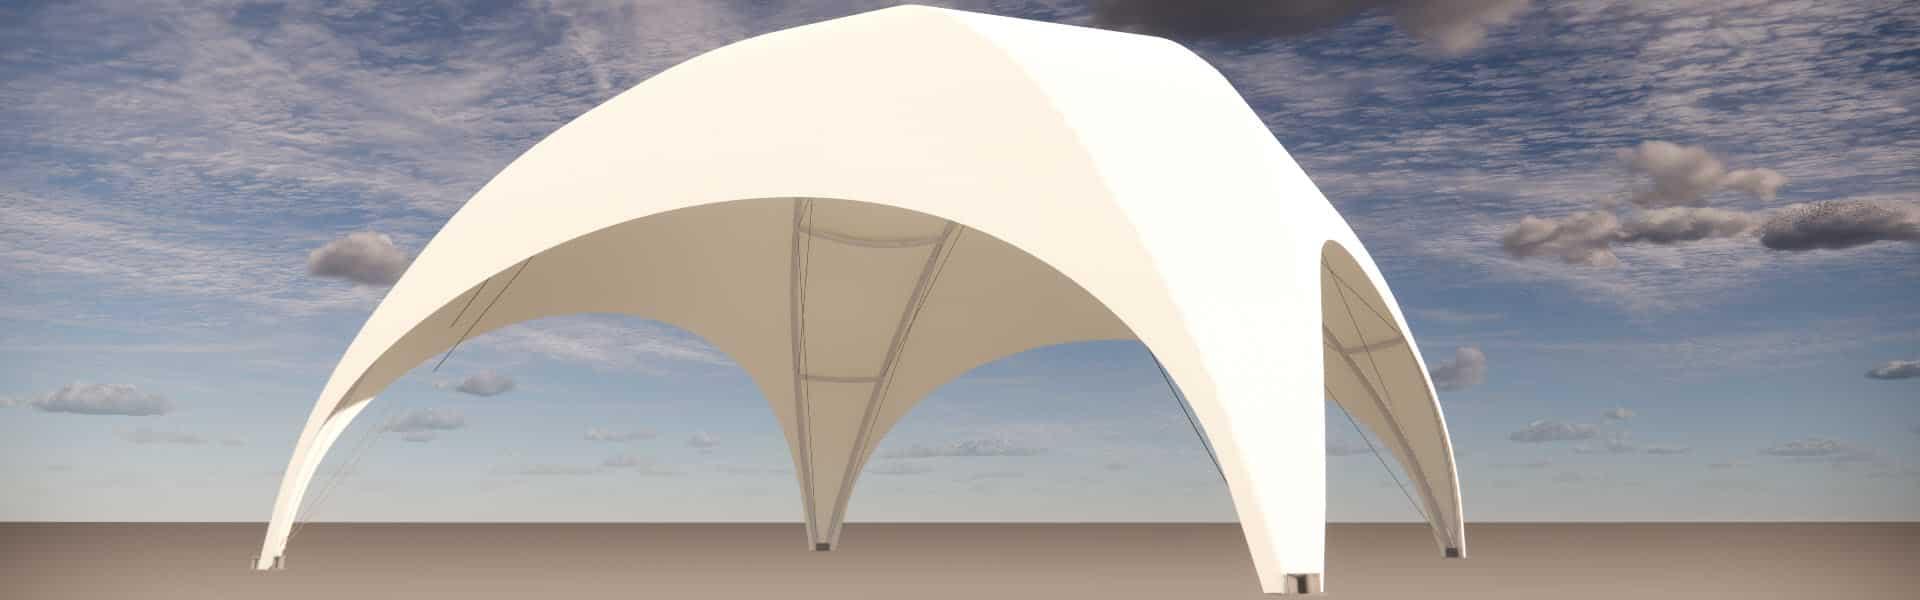 Kuppelbau überdacht 64 Quadratmeter